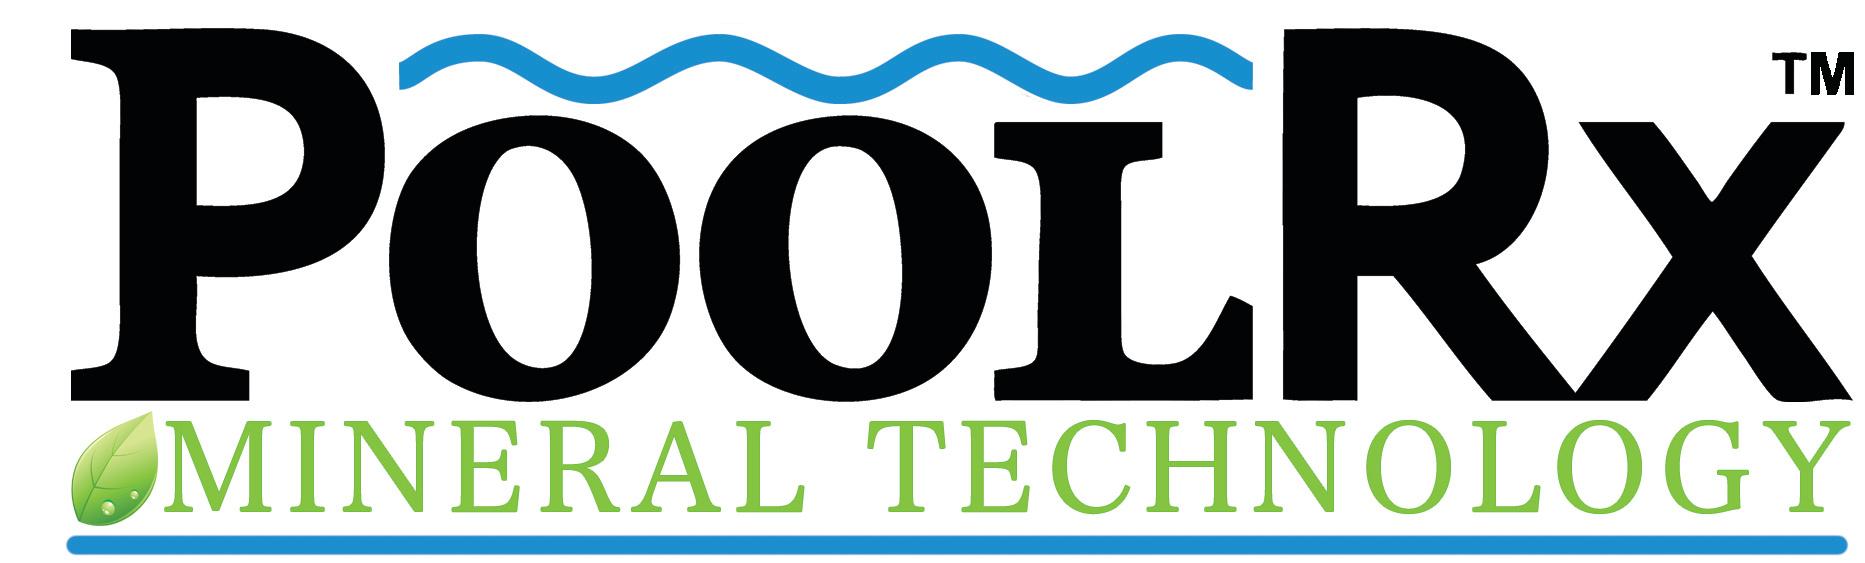 PoolRx logo